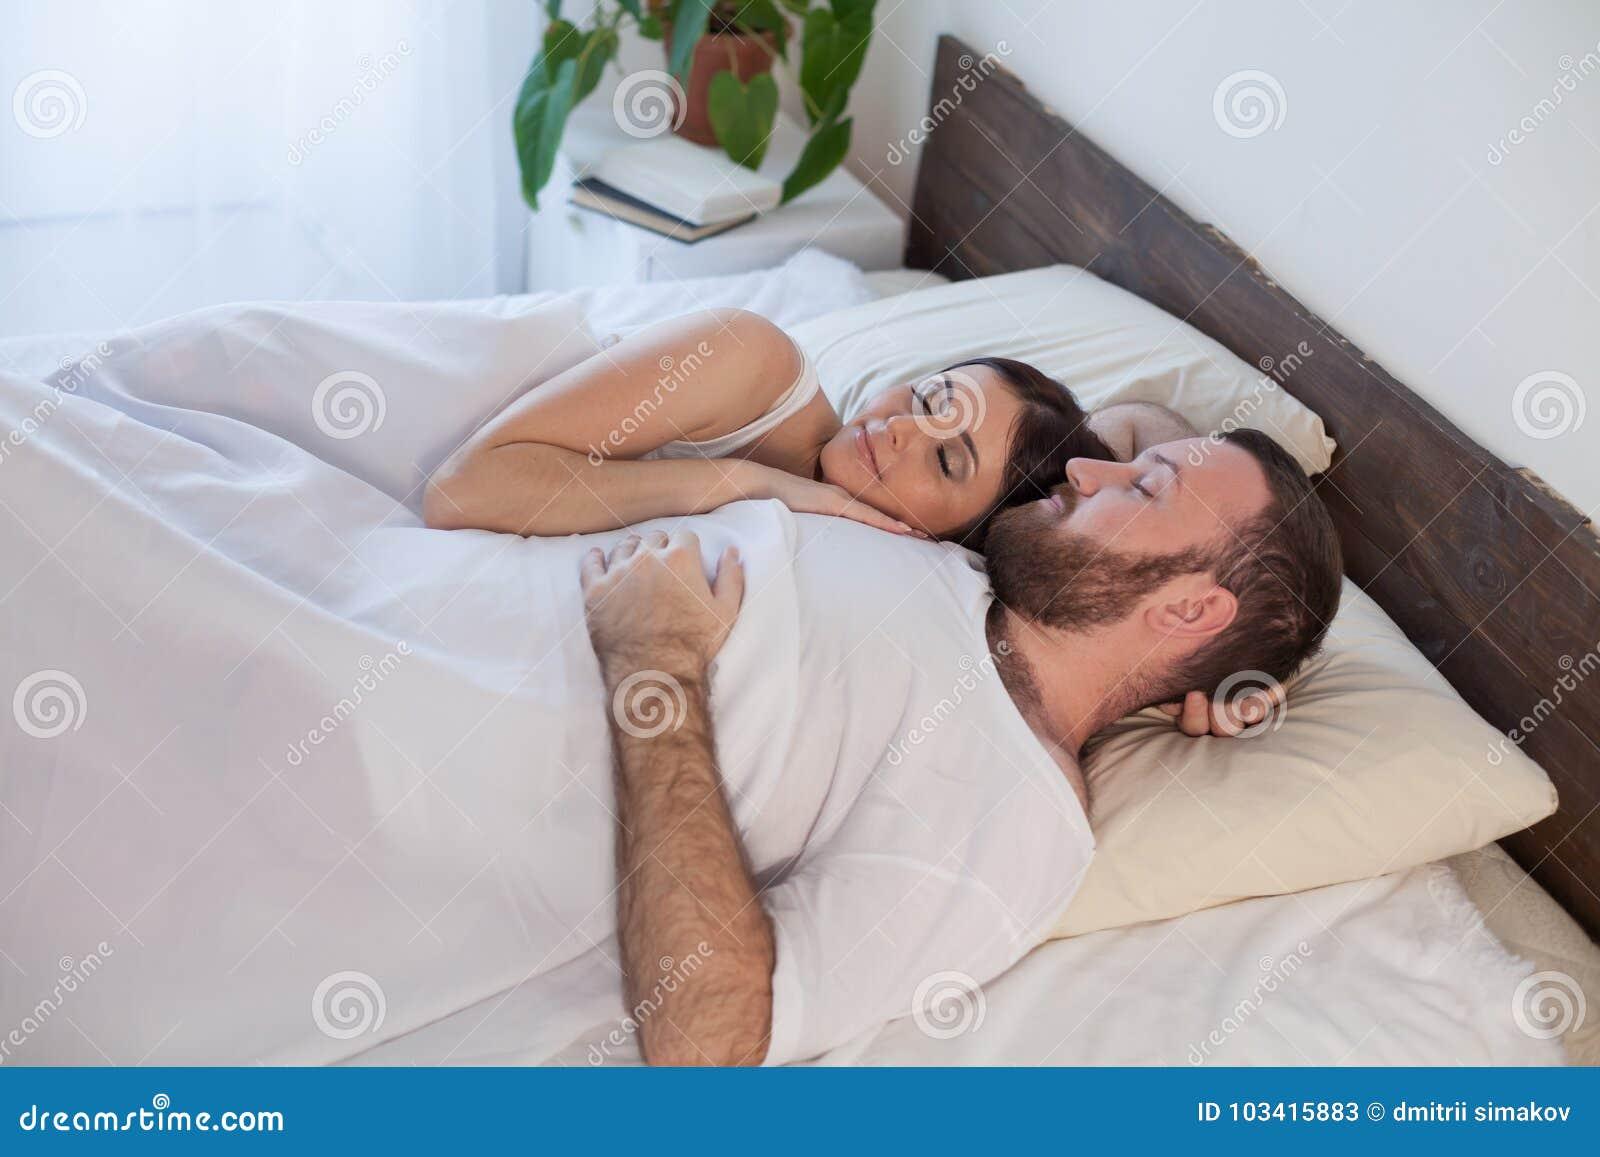 In bed men white 13 Things